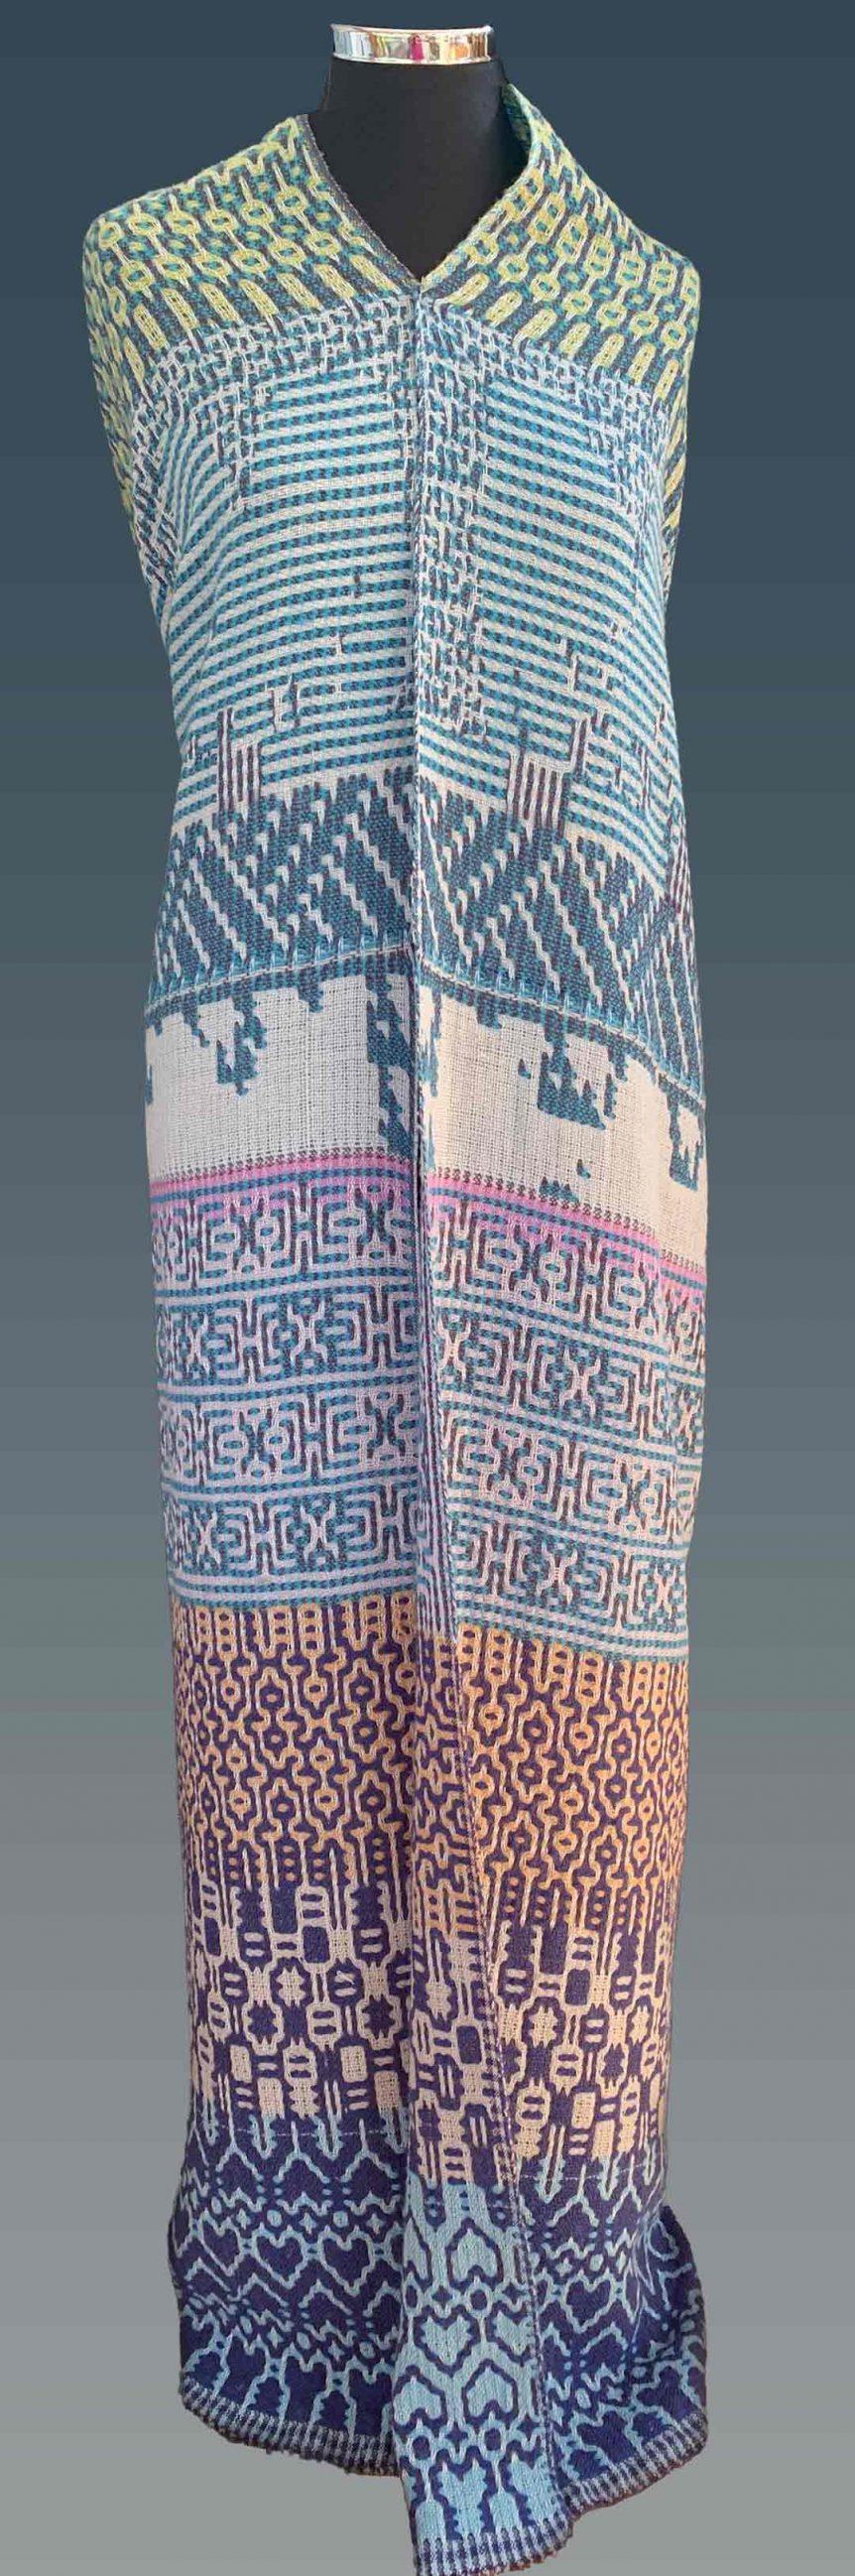 gallery of weaving